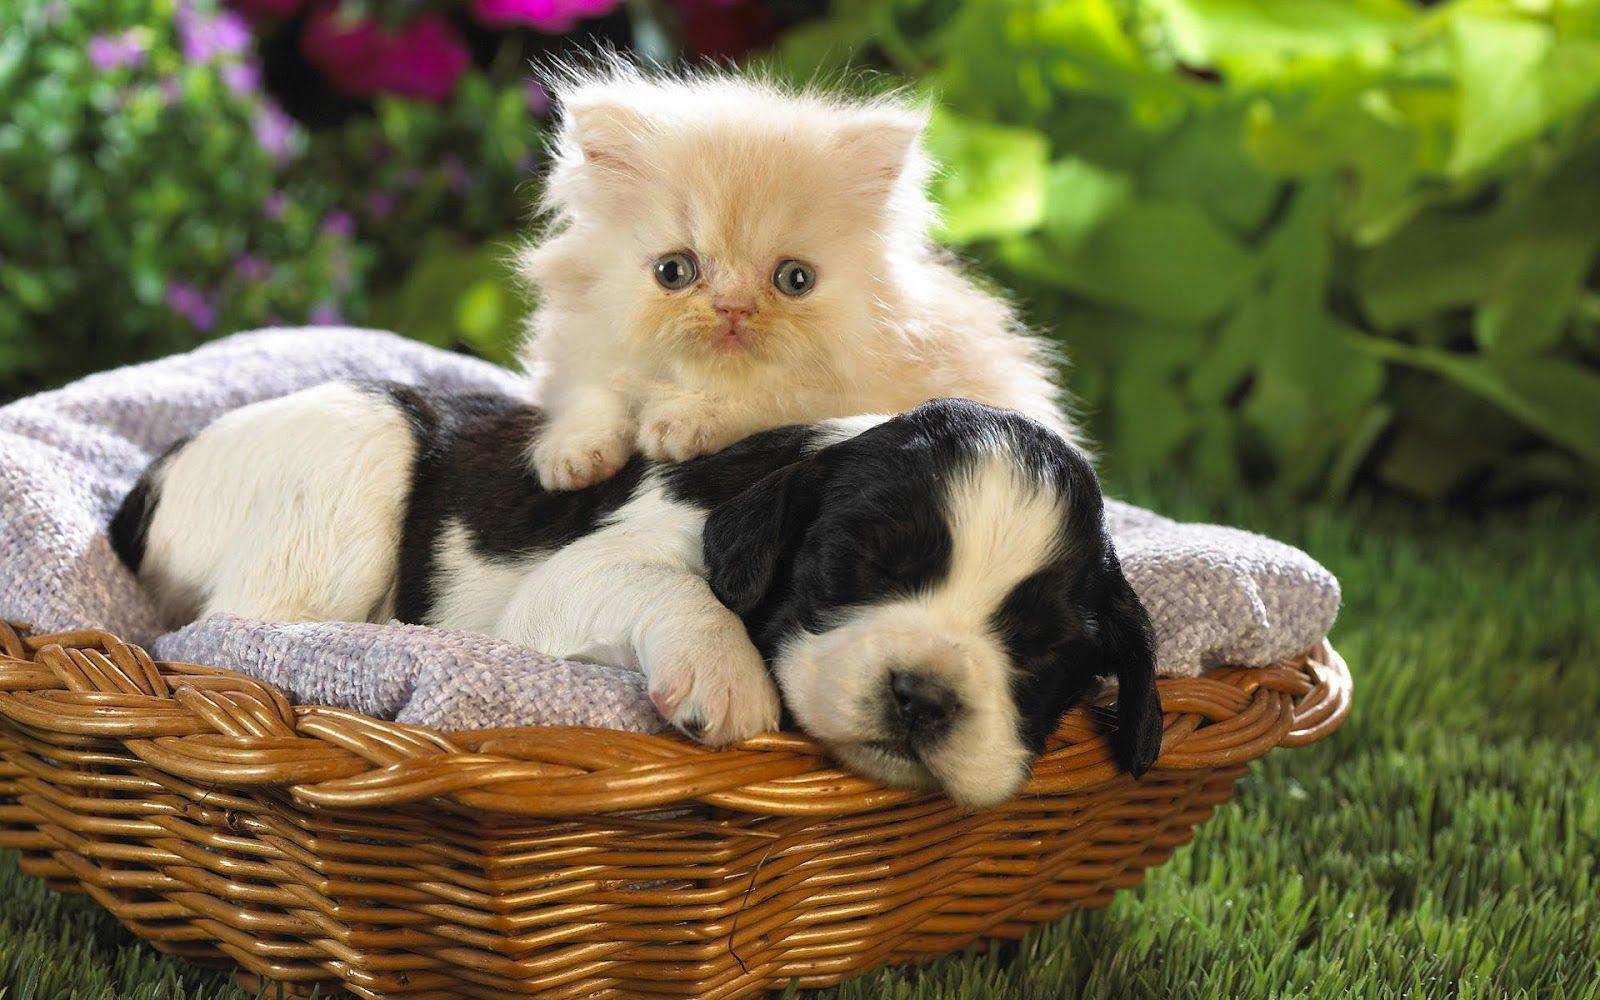 Zoo Animals Funny Cat & Dog Friendships